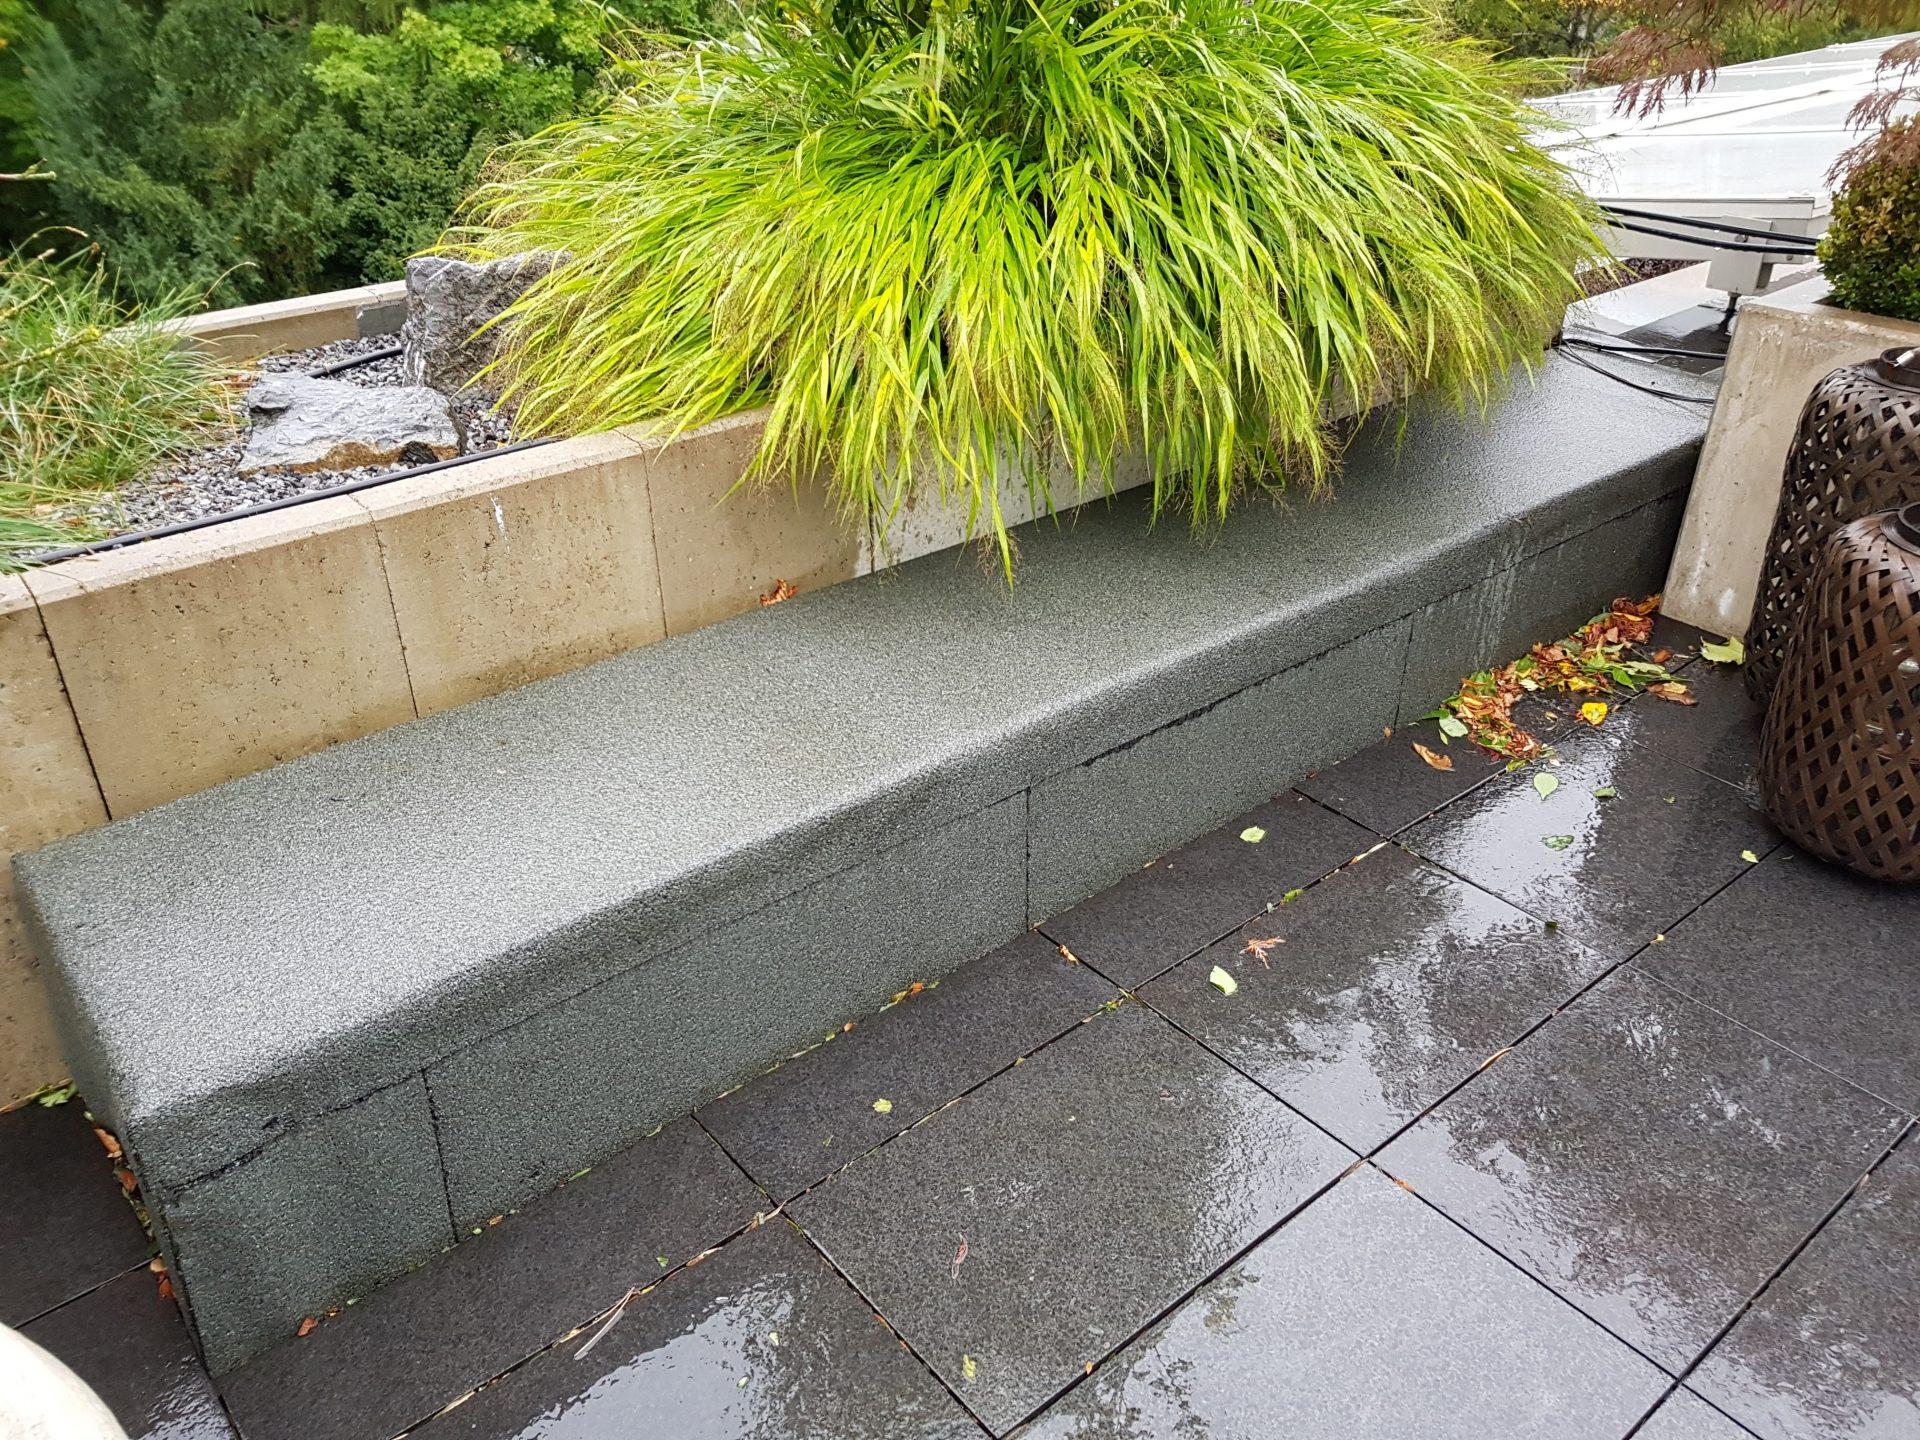 dachverkleidung aus beton | b&k design